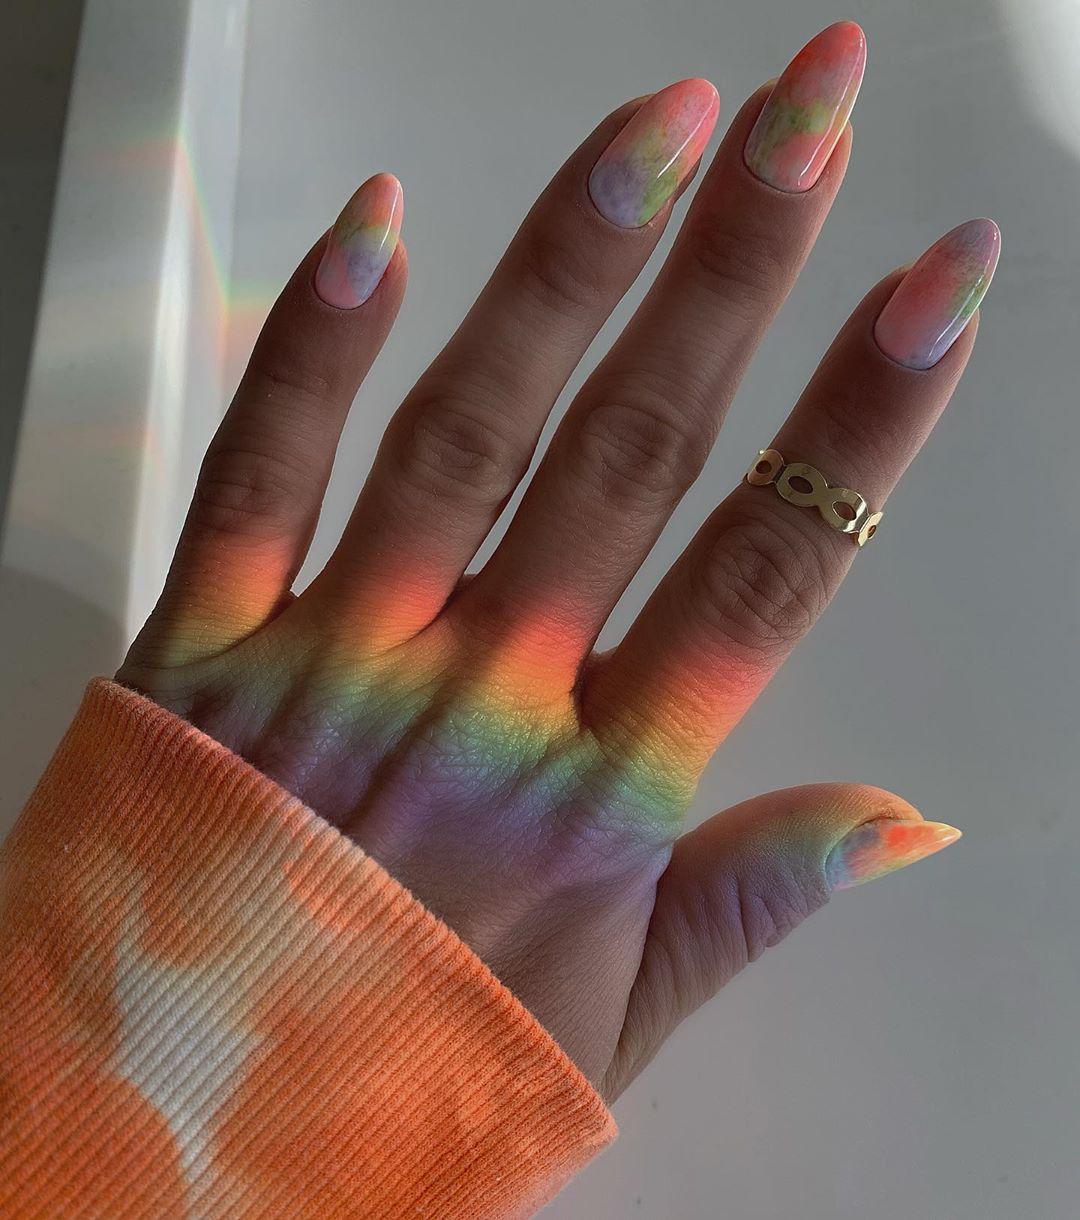 Como hacer tie dye jaspeado para renovar piezas y tener un - Cómo hacer tie-dye jaspeado para renovar piezas y tener un aspecto increíble